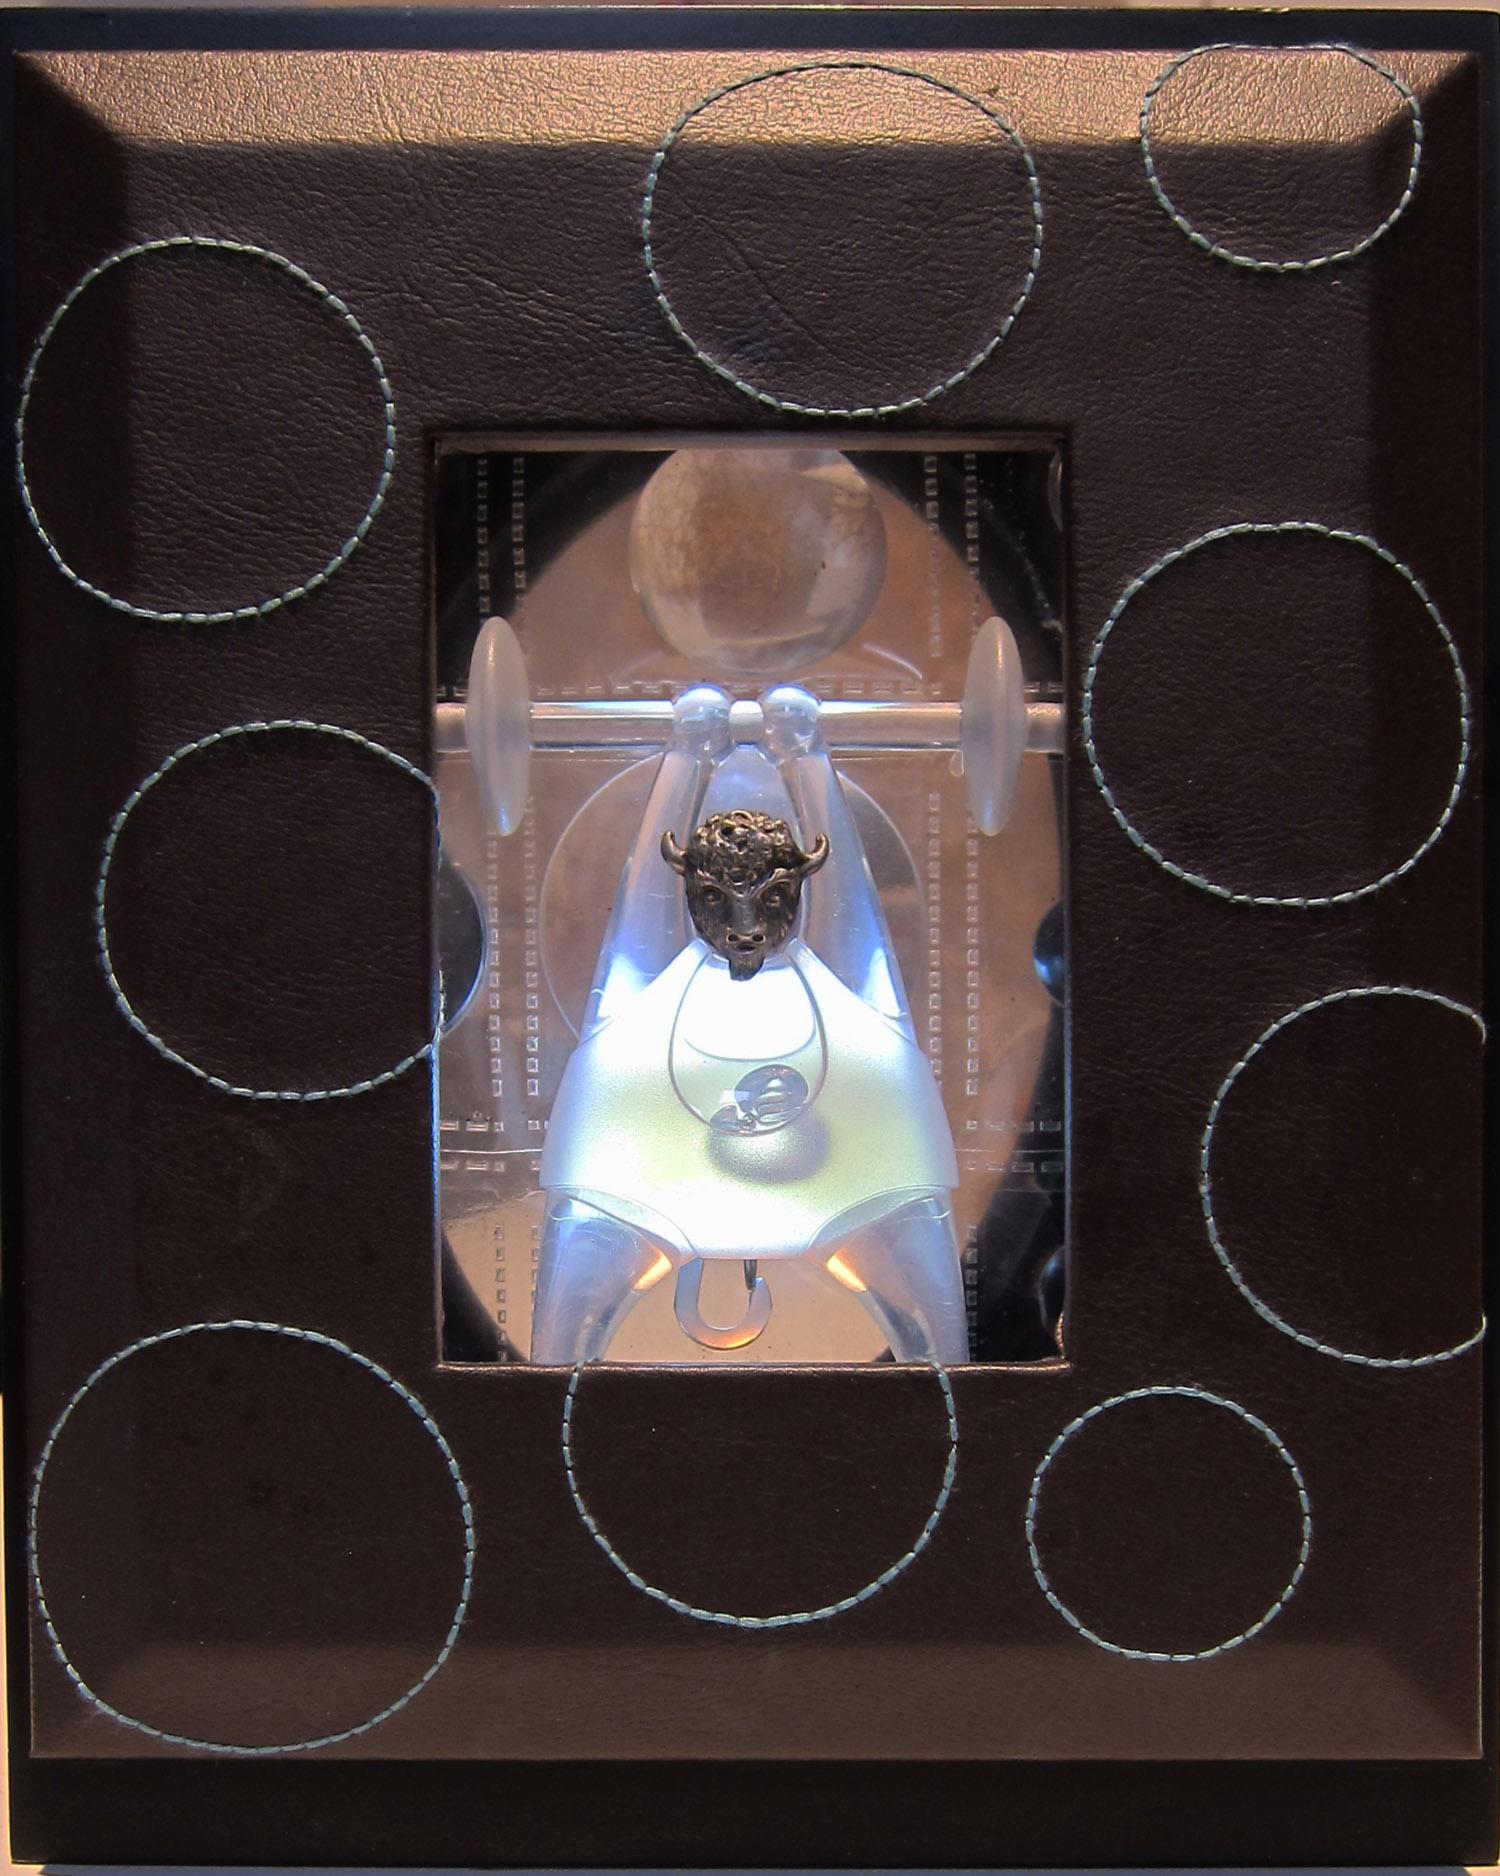 5cj(0) - Mister Bubbles, acrylic, light, metal, wood, 9x7x3 in.,  2010.jpg